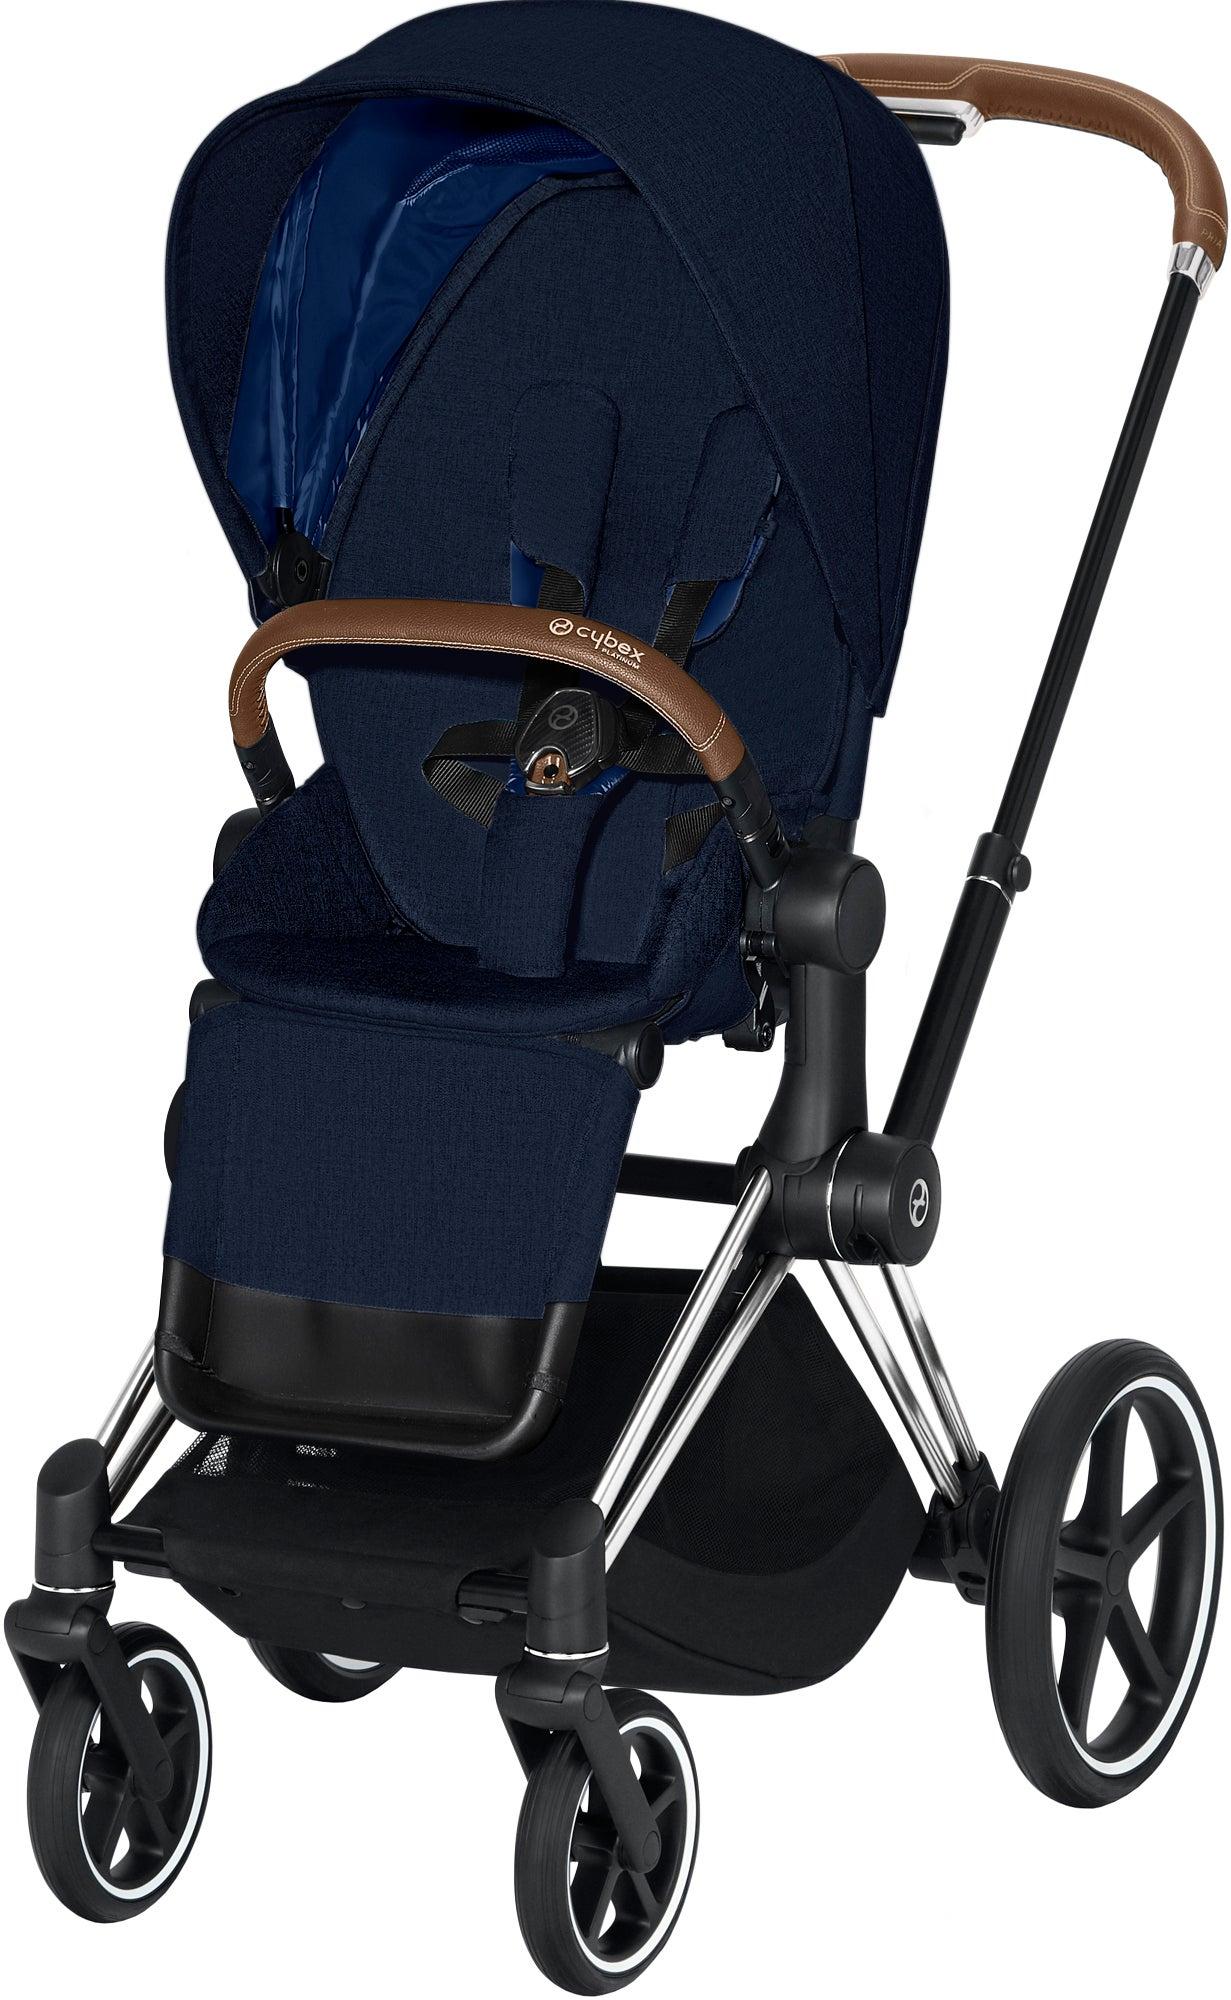 Cybex Priam Plus Sittvagn, Midnight Blue/Chrome Brown